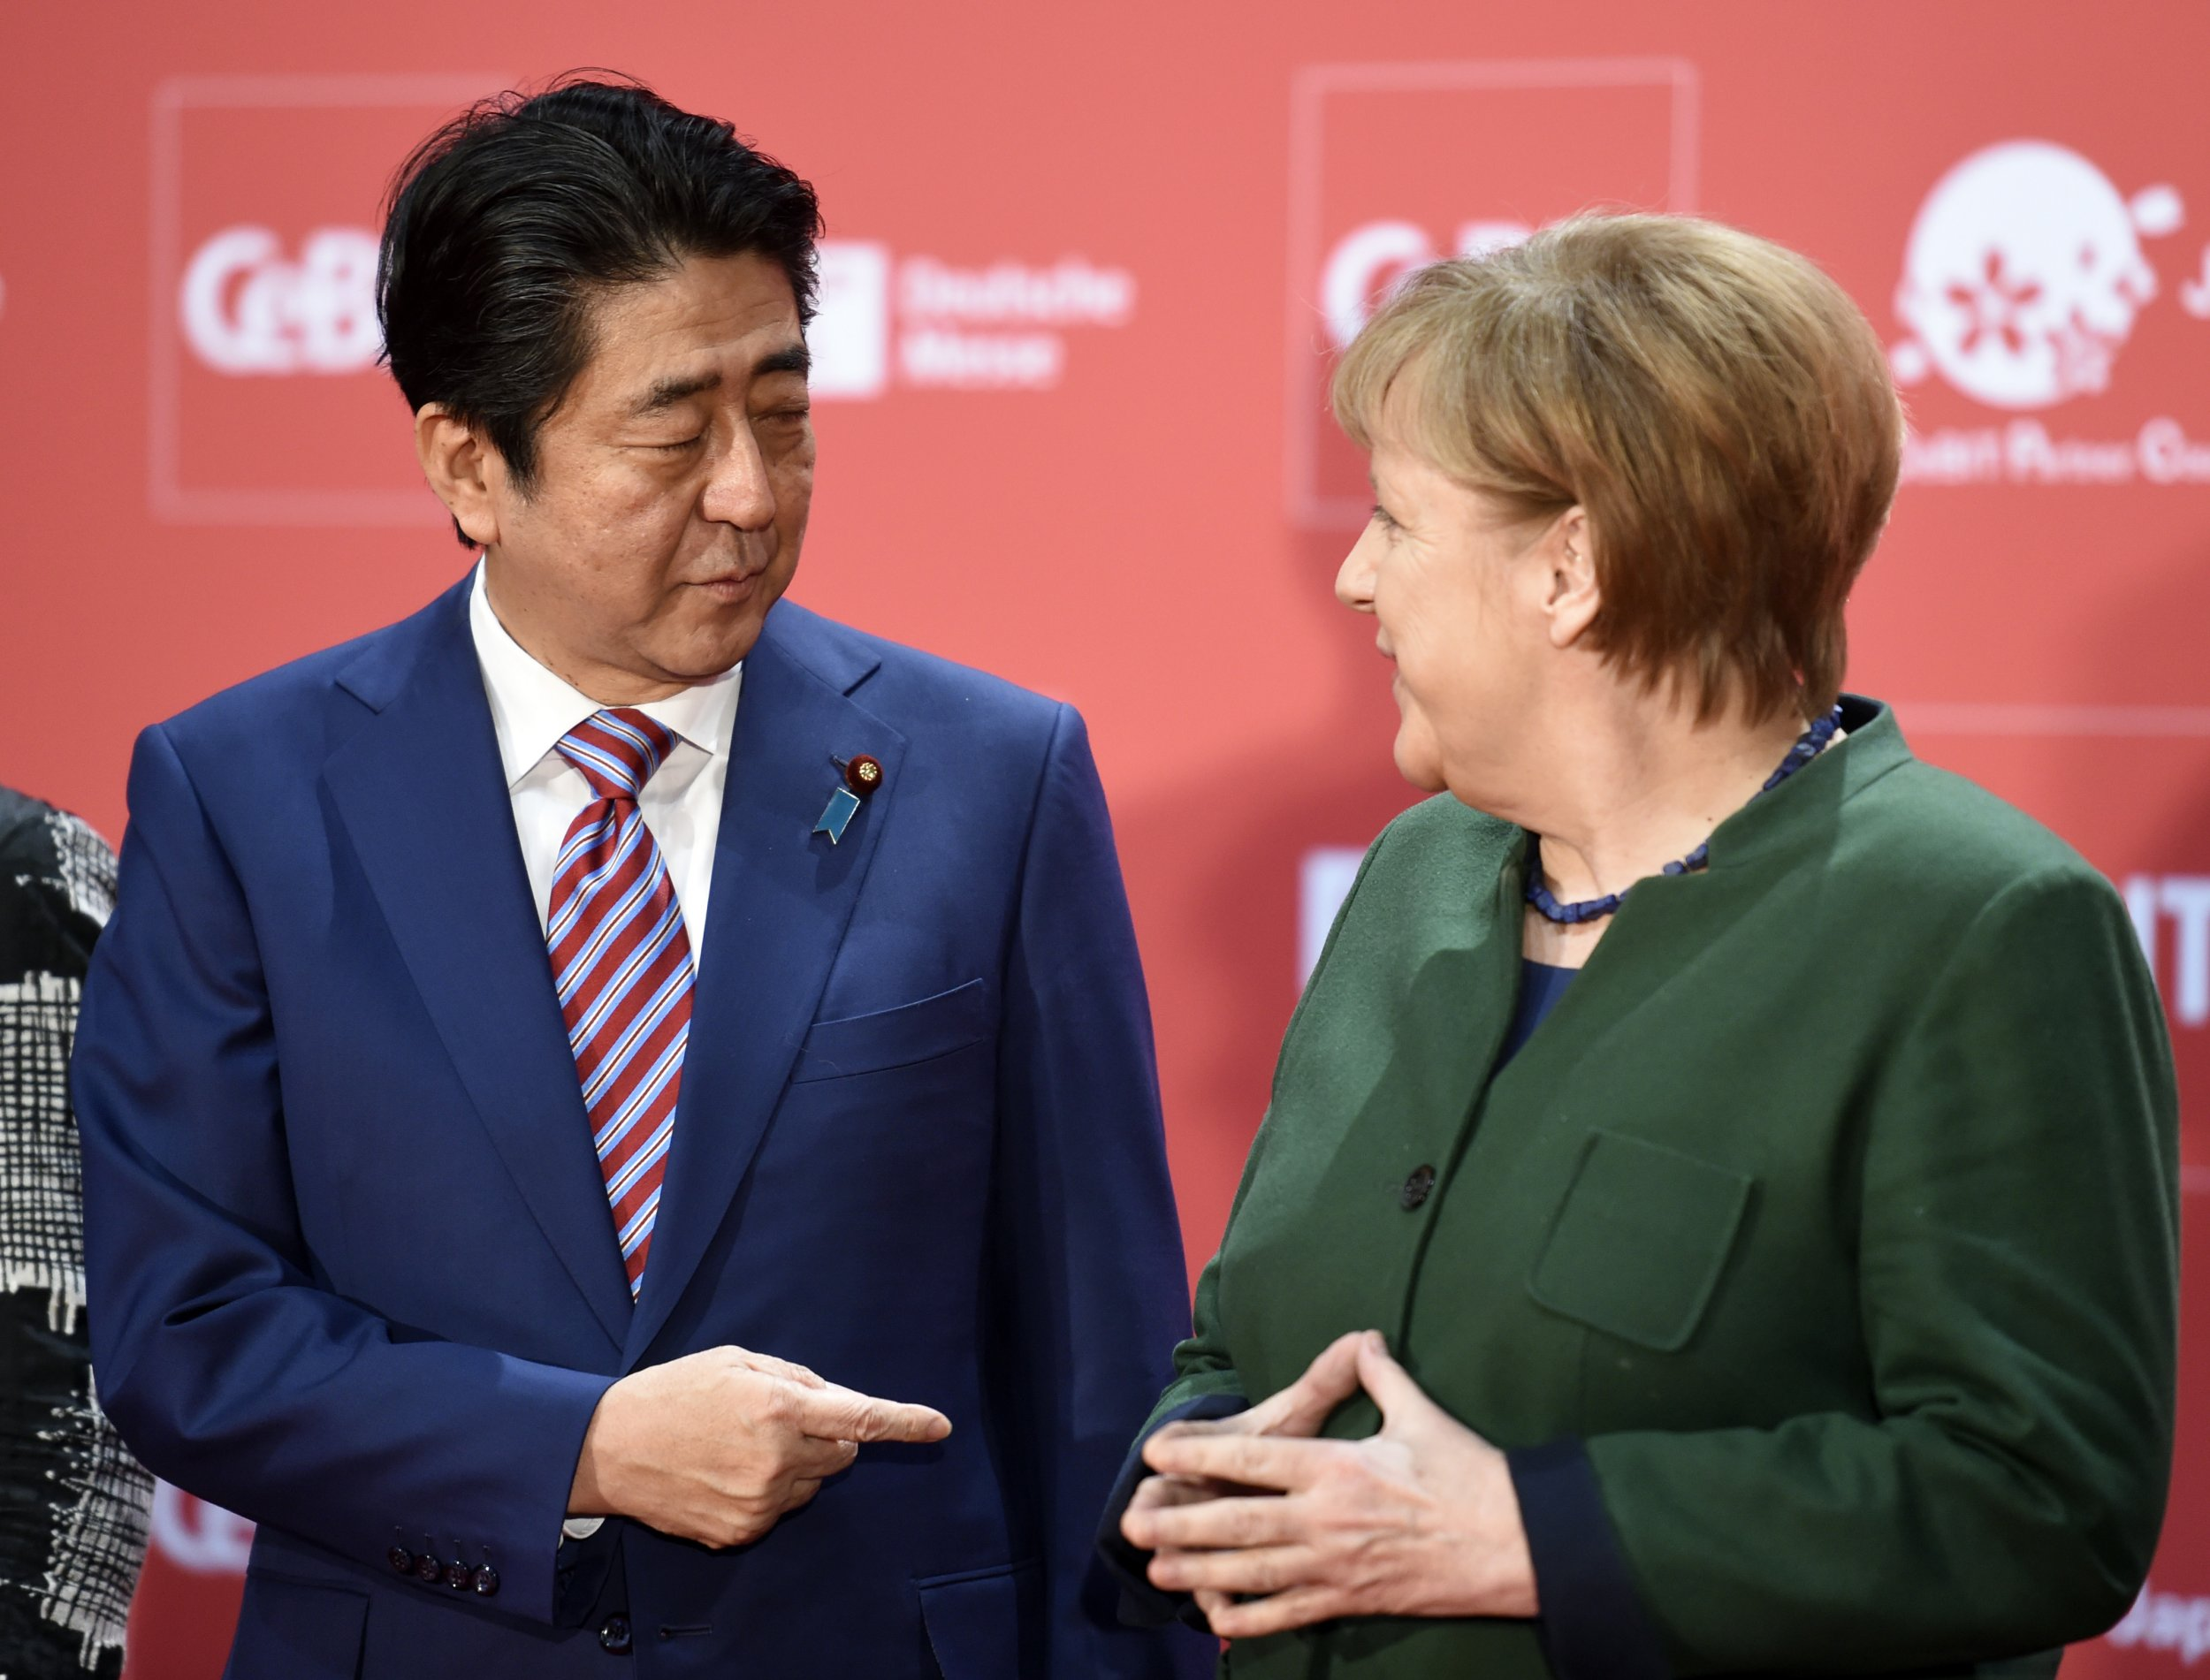 Germany's Angela Merkel and Japan's Shinzo Abe endorse free trade with jabs at Trump's rhetoric